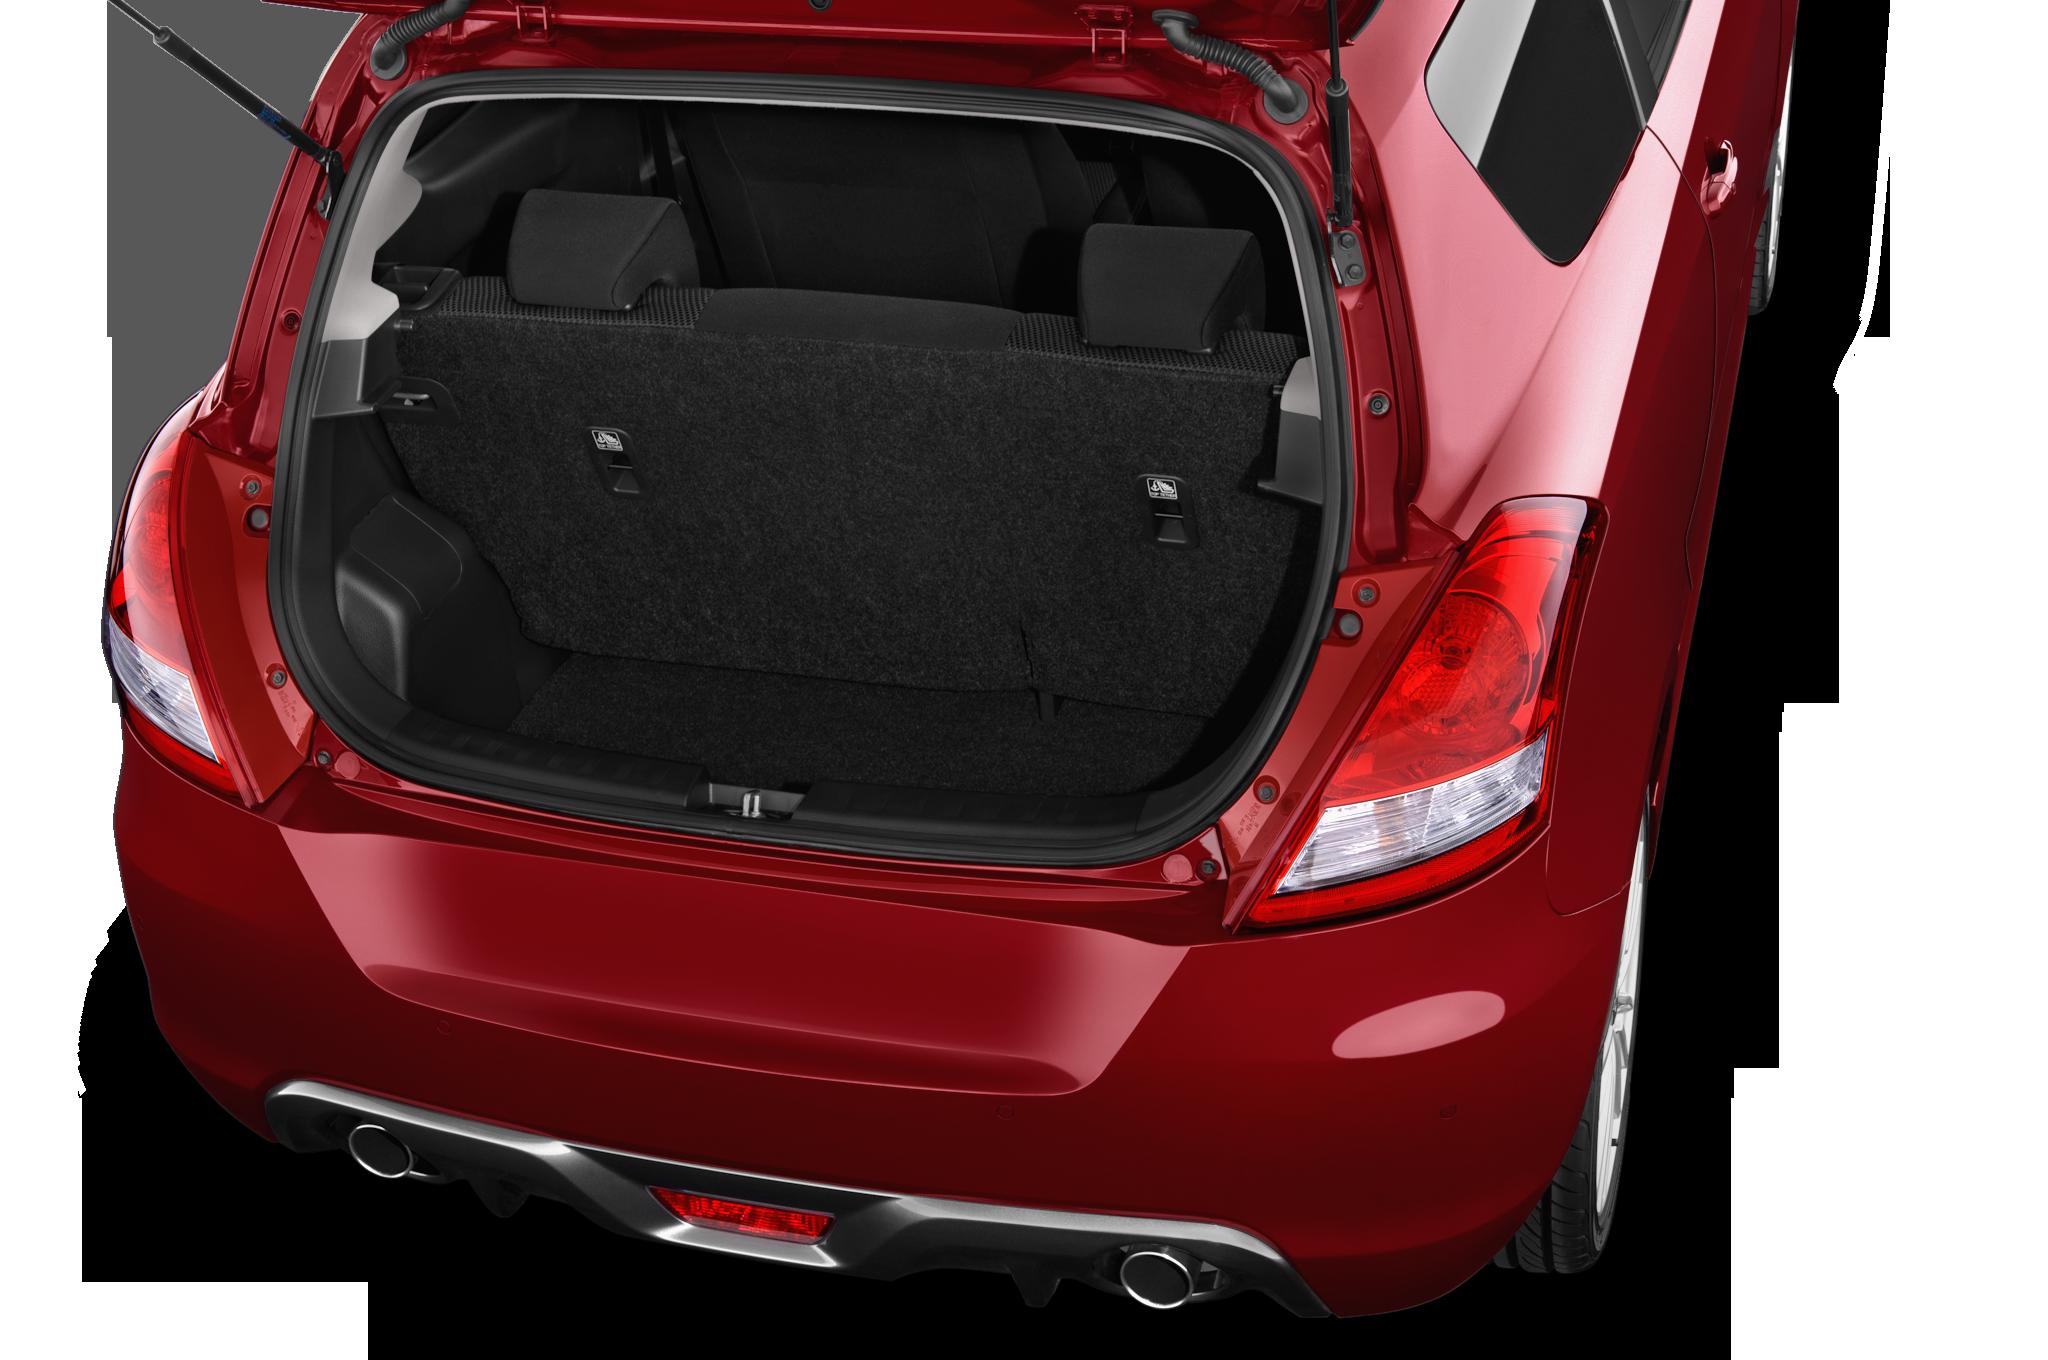 Suzuki Swift company car boot space